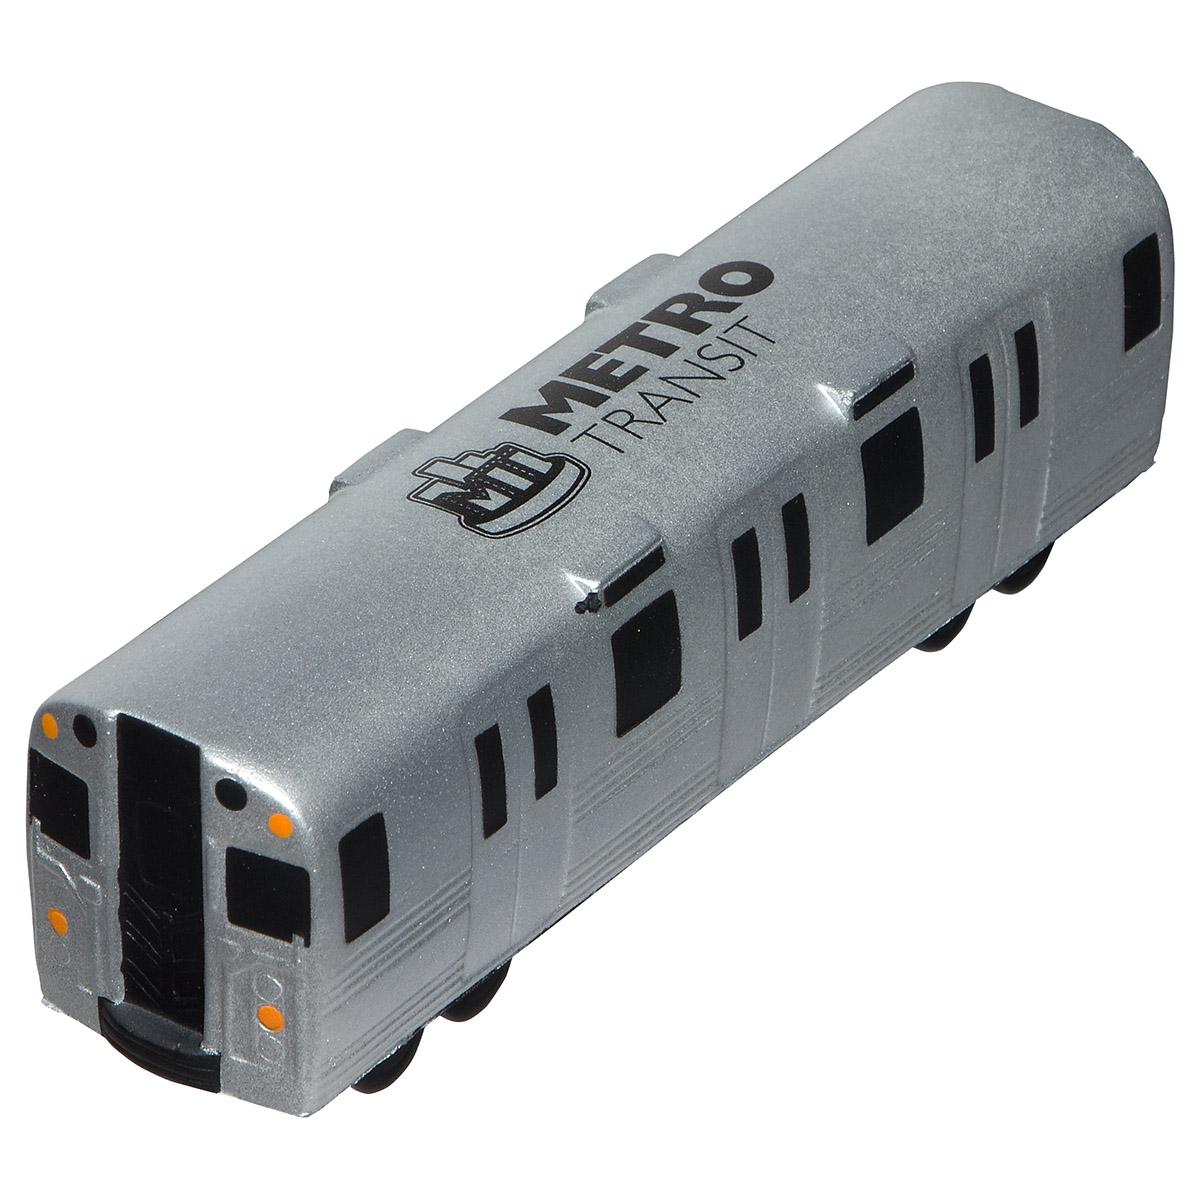 Metro Train Stress Reliever, LTR-MT34, 1 Colour Imprint